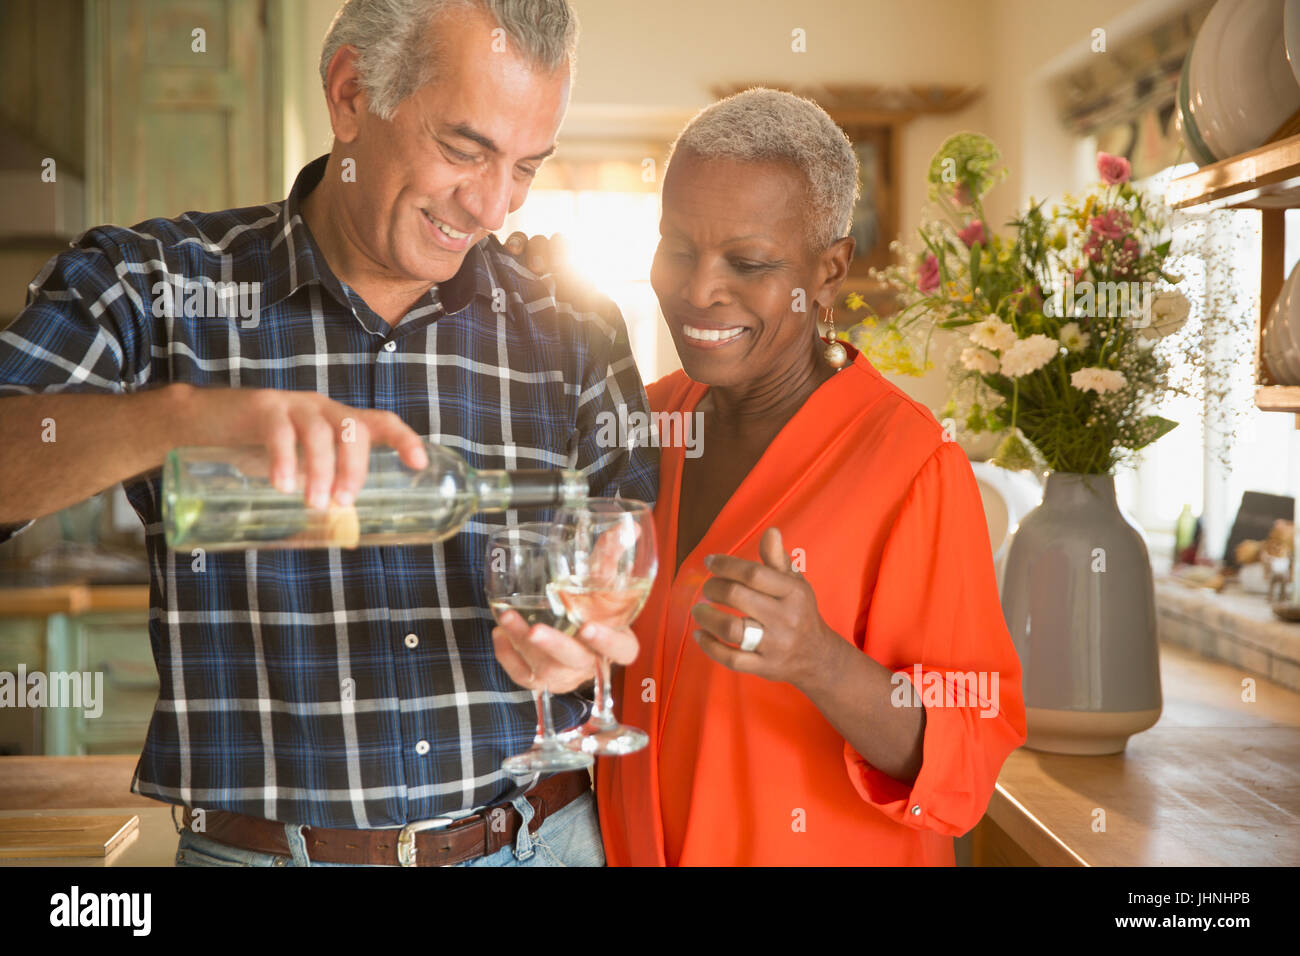 Smiling senior couple pouring white wine in kitchen - Stock Image